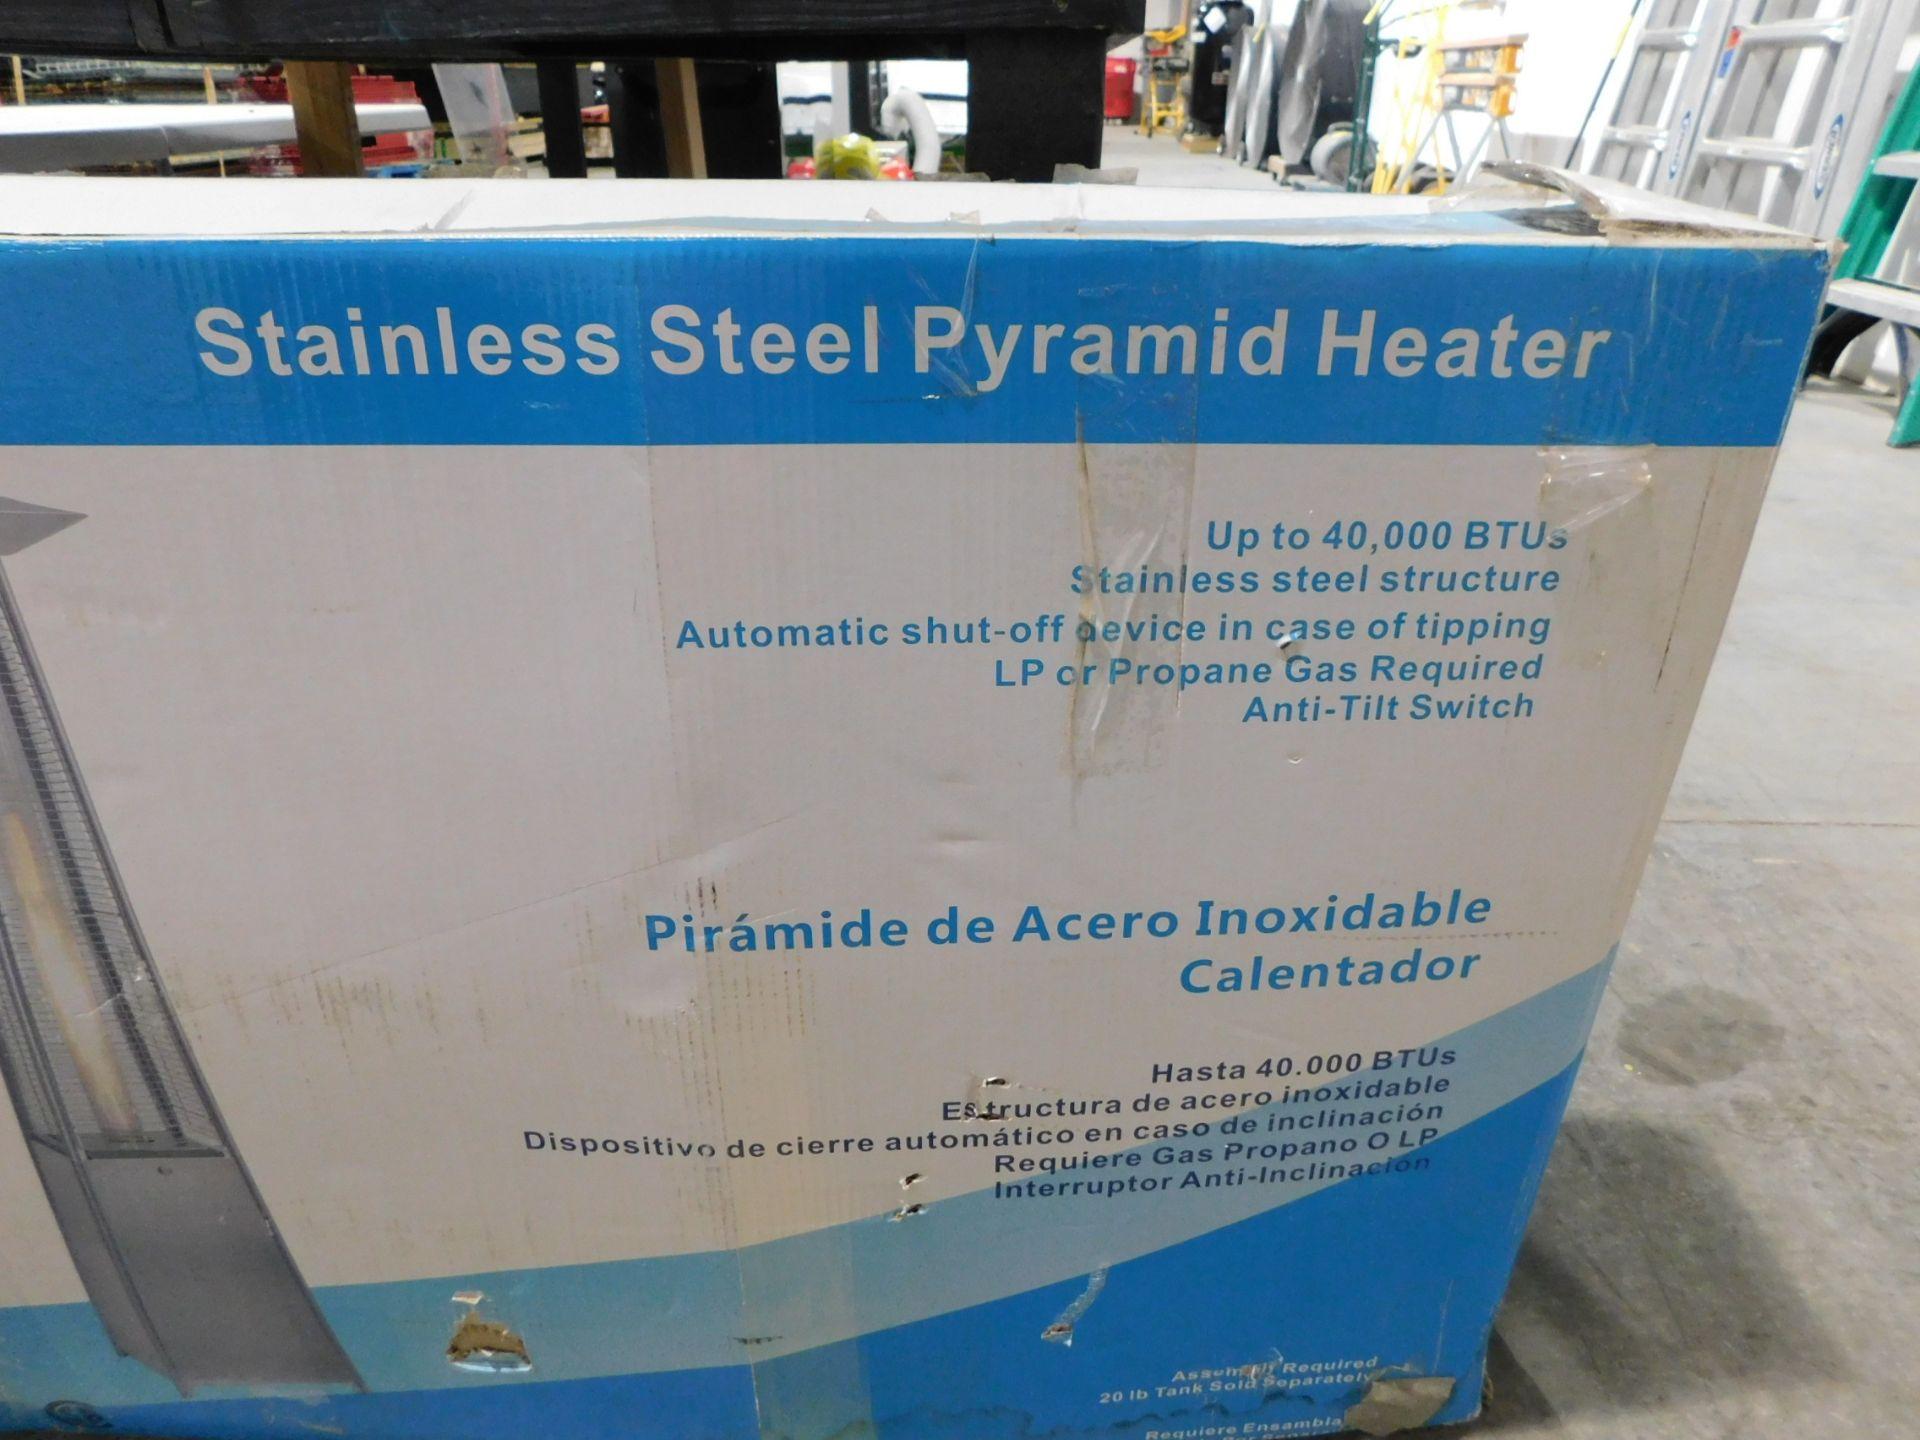 Lot 18 - Garden Sun Stainless Steel Pyramid Heater, LP or Propane Gas